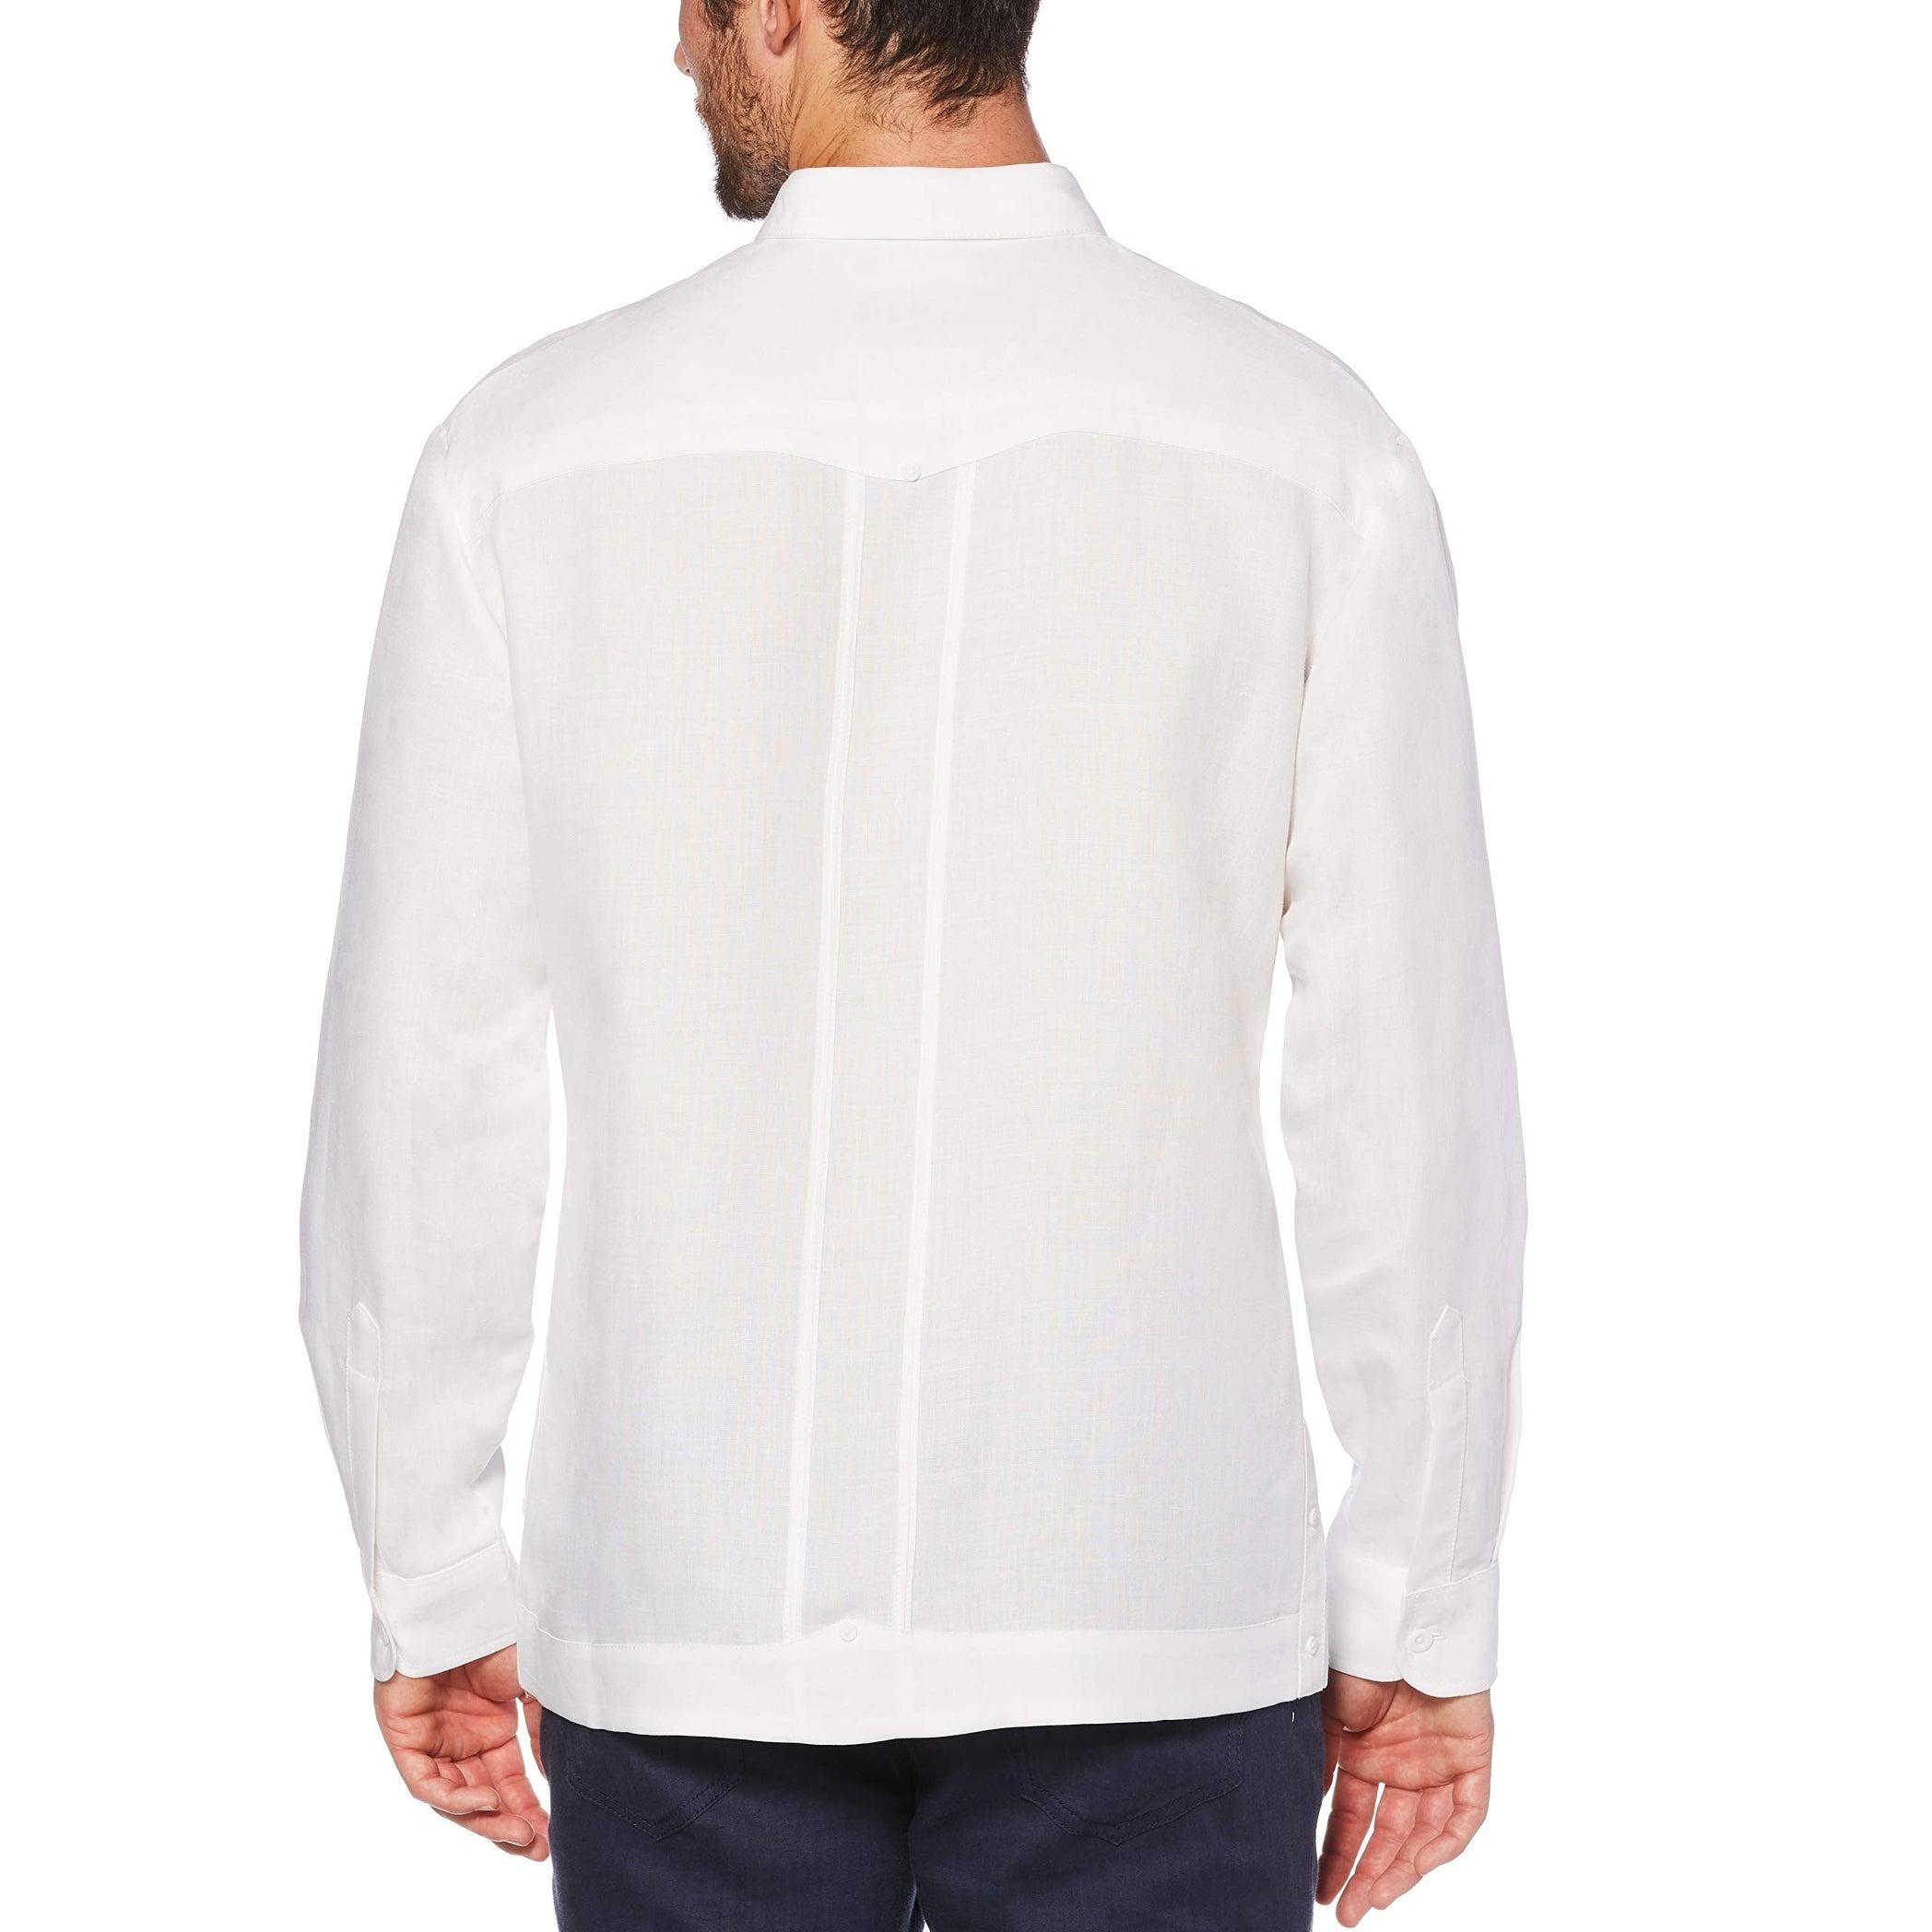 Cubavera Men/'s Short Sleeve Embroidered Guayabera Shirt Choose SZ//Color